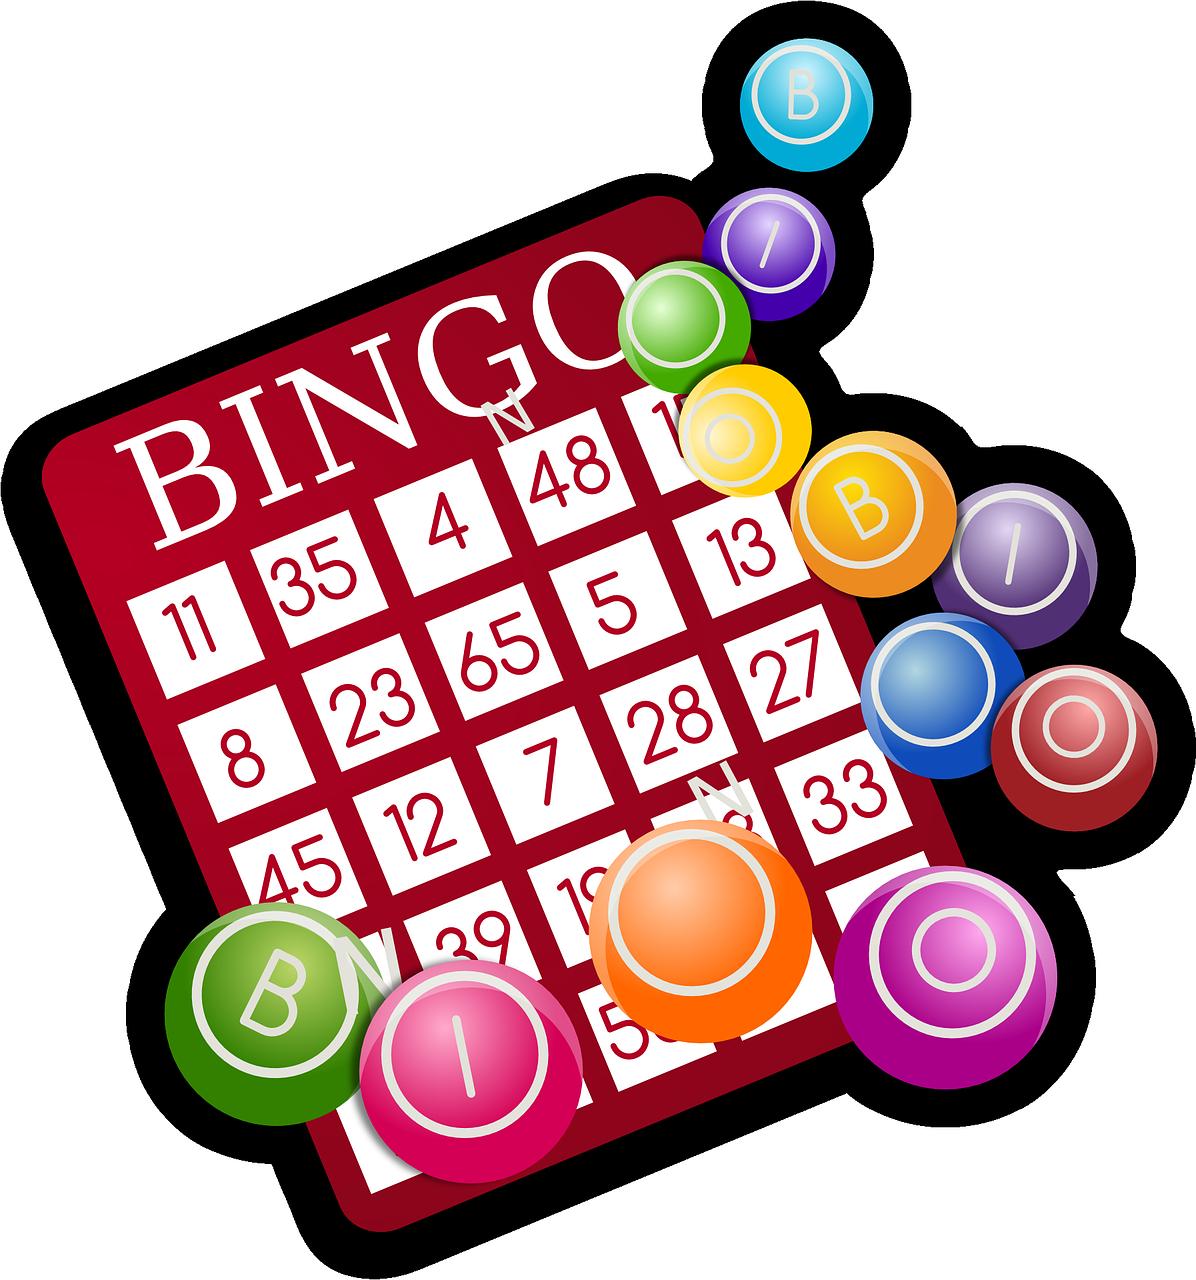 https://pixabay.com/en/bingo-gambling-game-luck-159974/